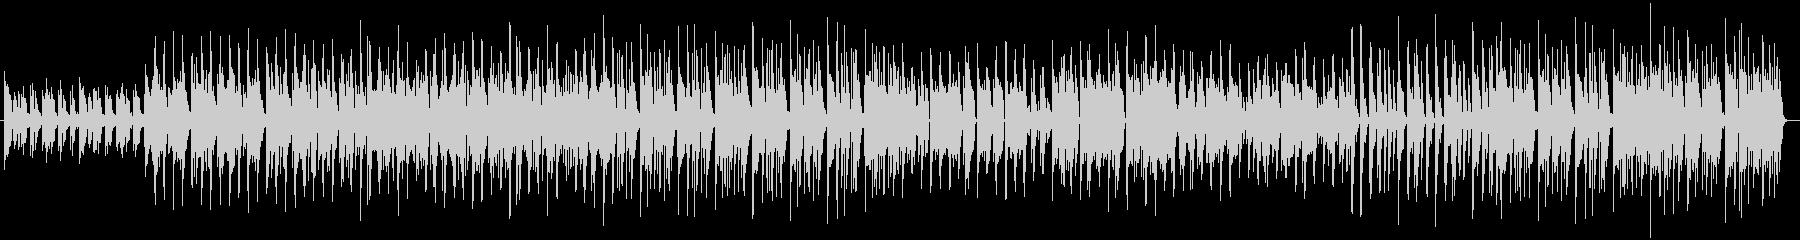 CoolでFunkな曲調 Ver.2の未再生の波形